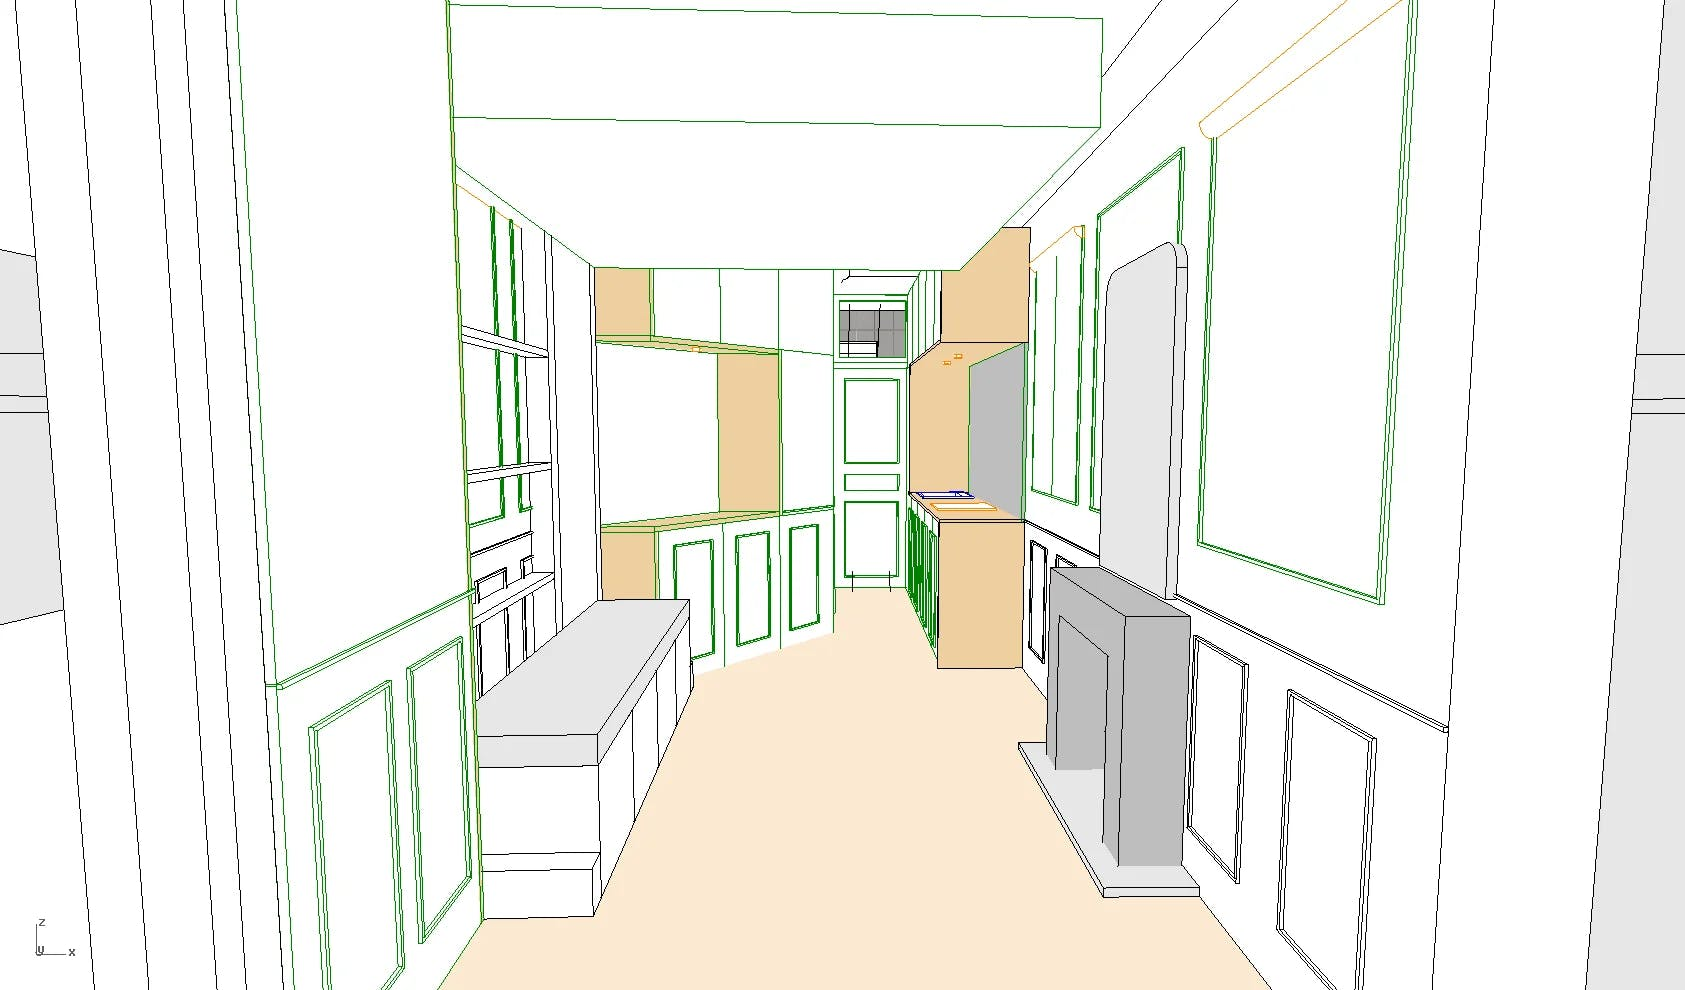 plan 3d 2 rénovation studio